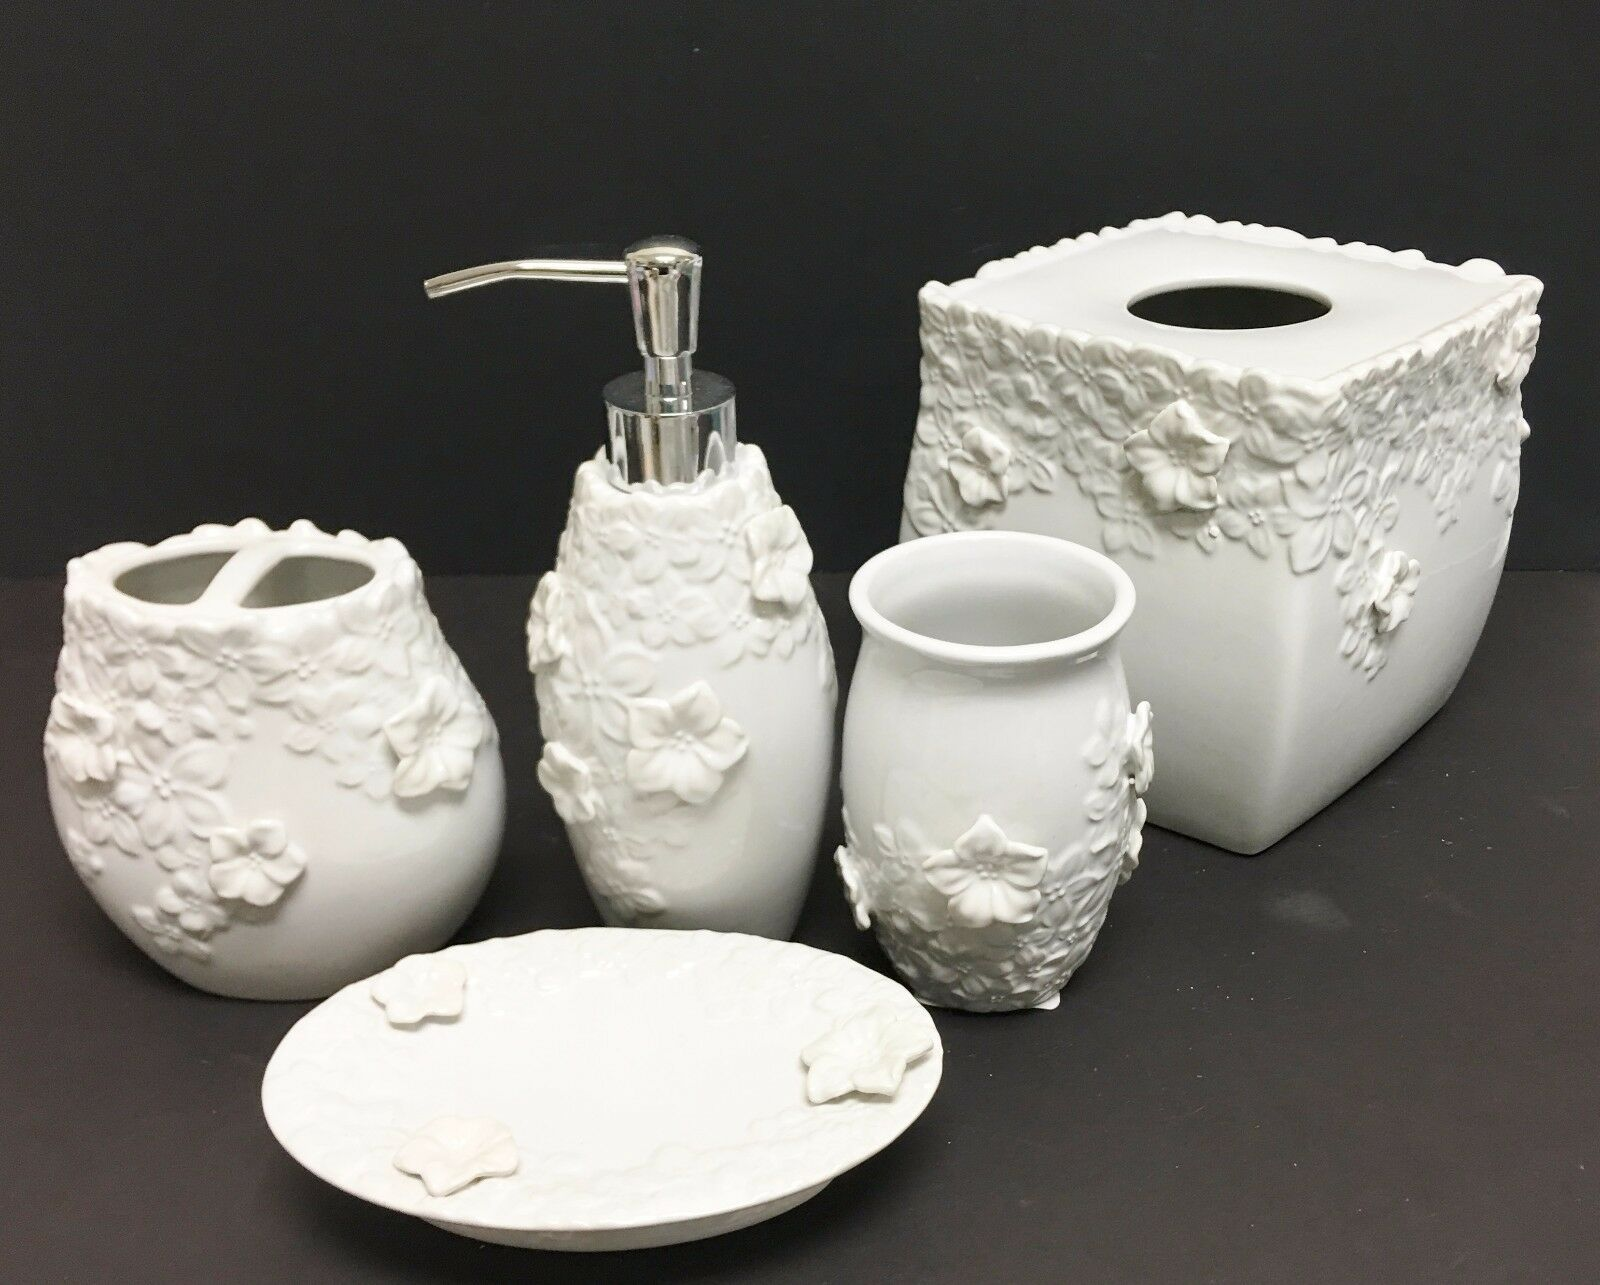 NEW 5 PC SET Weiß 3D FLORAL CERAMIC SOAP DISPENSER,NAPKIN,DISH,TUMBLER,TOOTHBRU